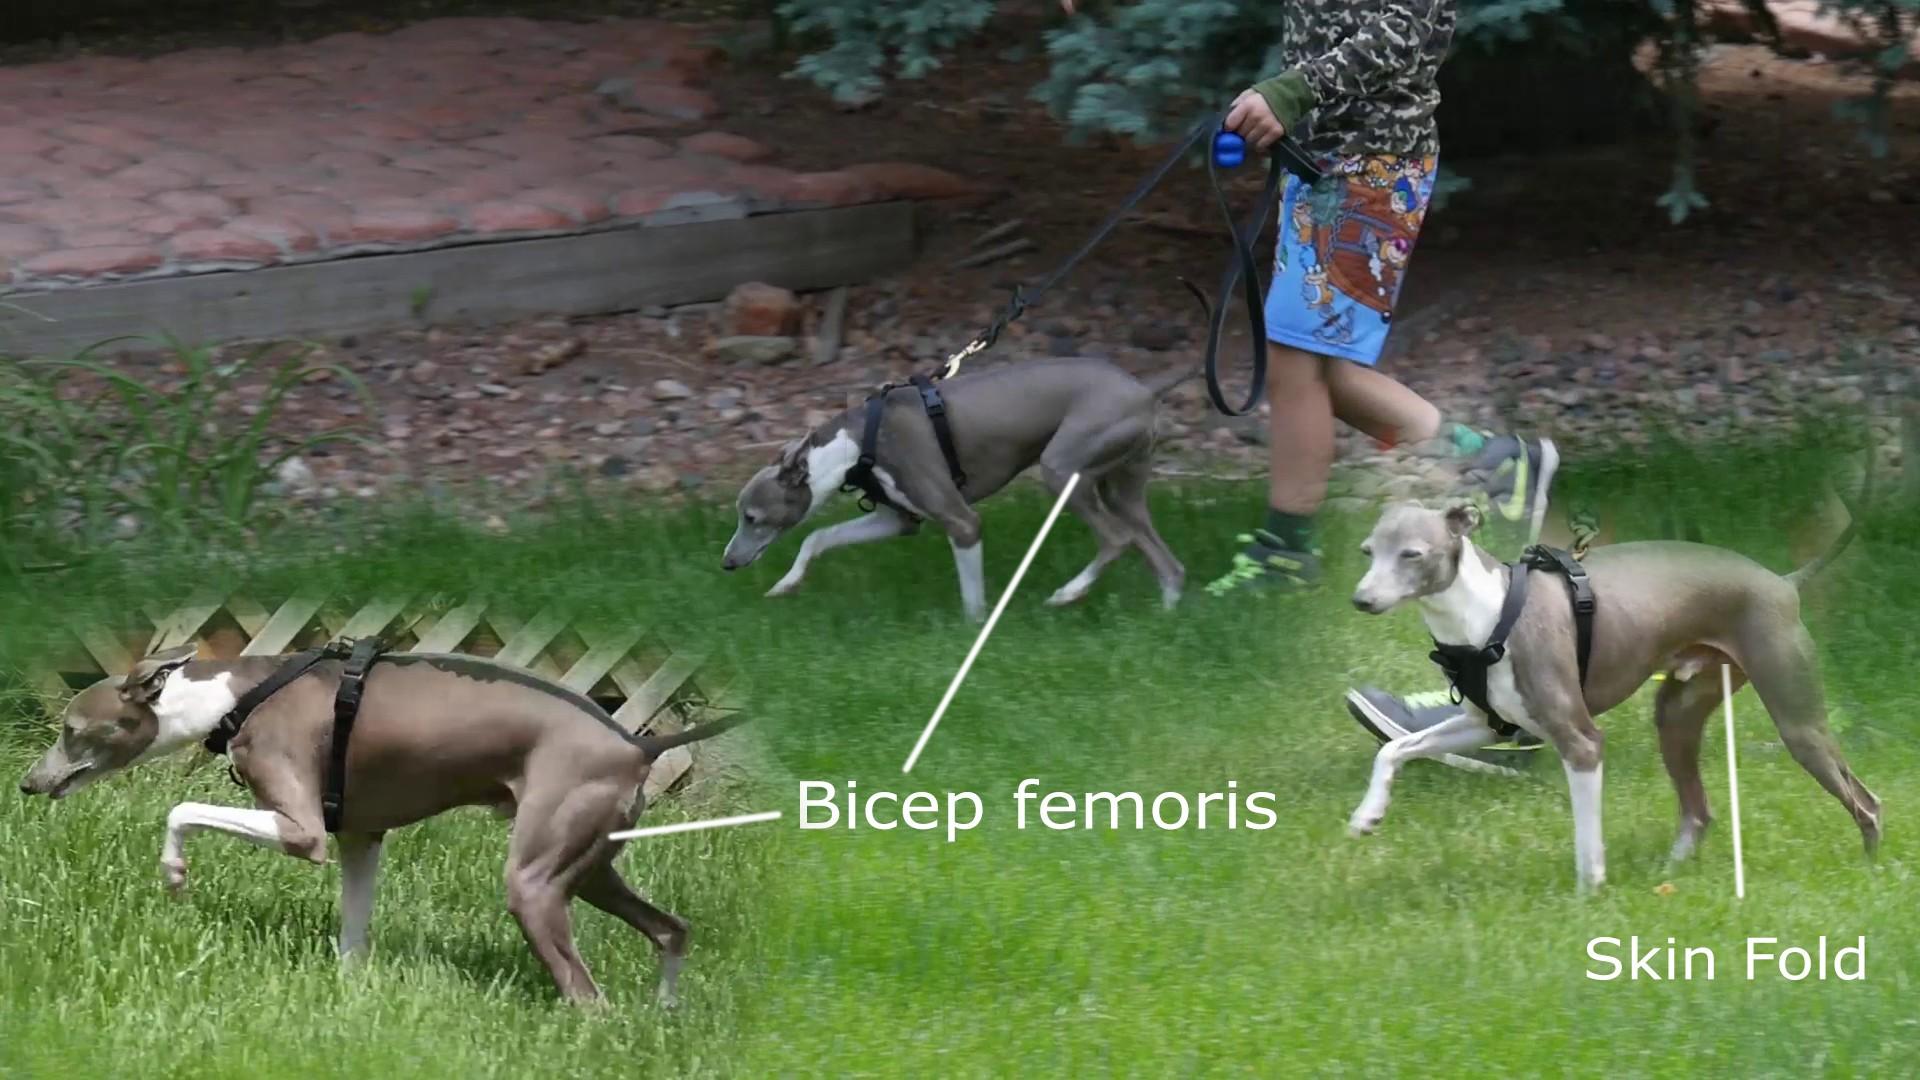 image bicepsfemoris02.jpeg